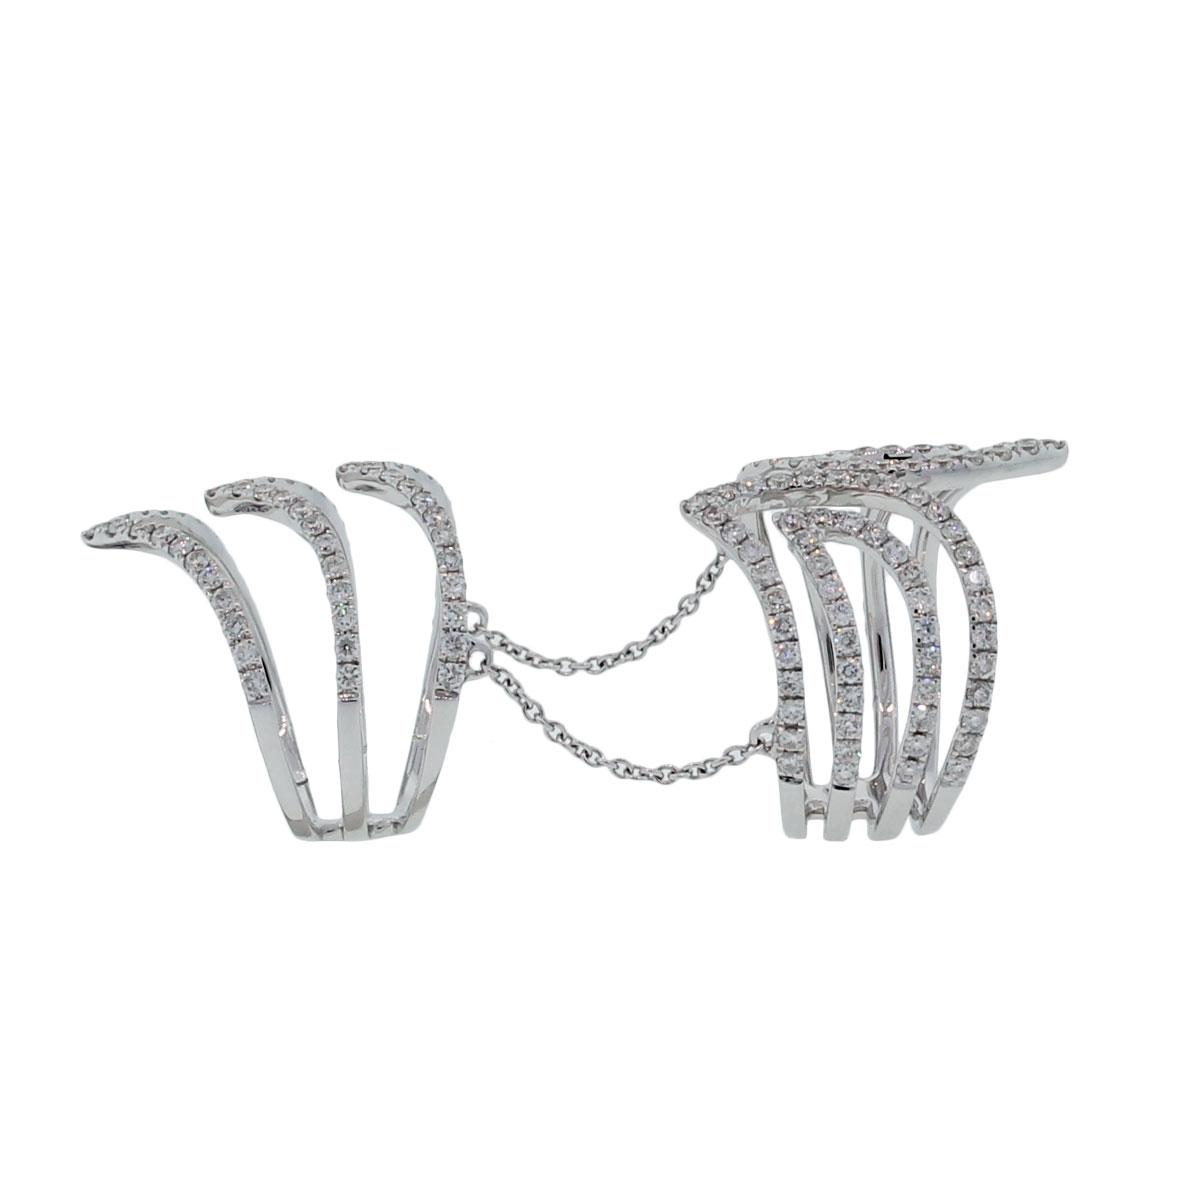 18k White Gold 1 85ctw Diamond Chain Ring